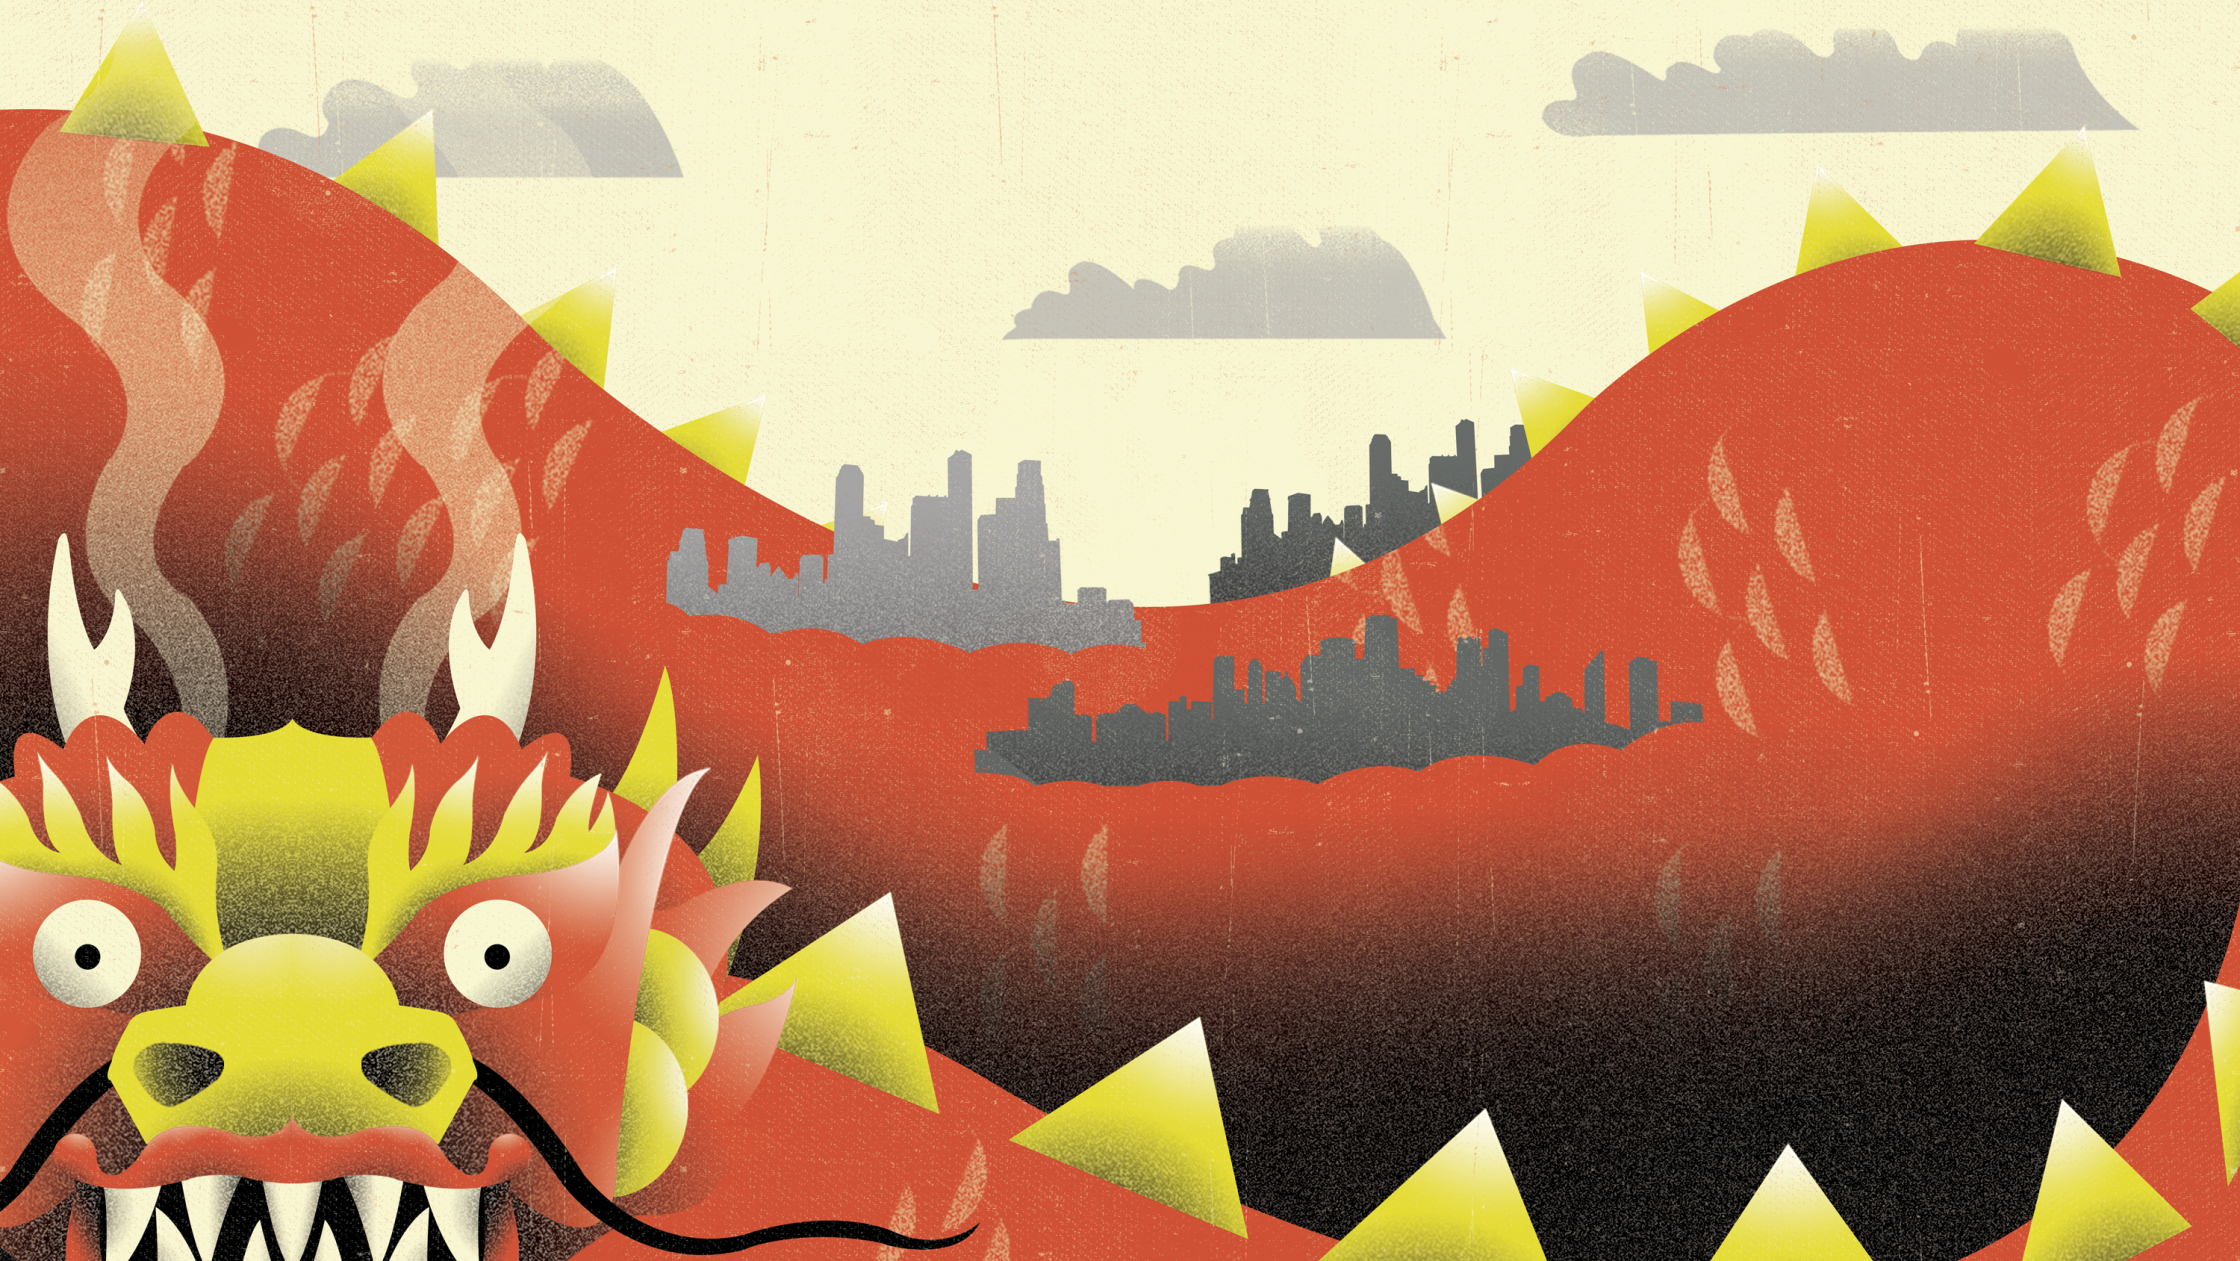 China City Growth Economy Dragon BBC